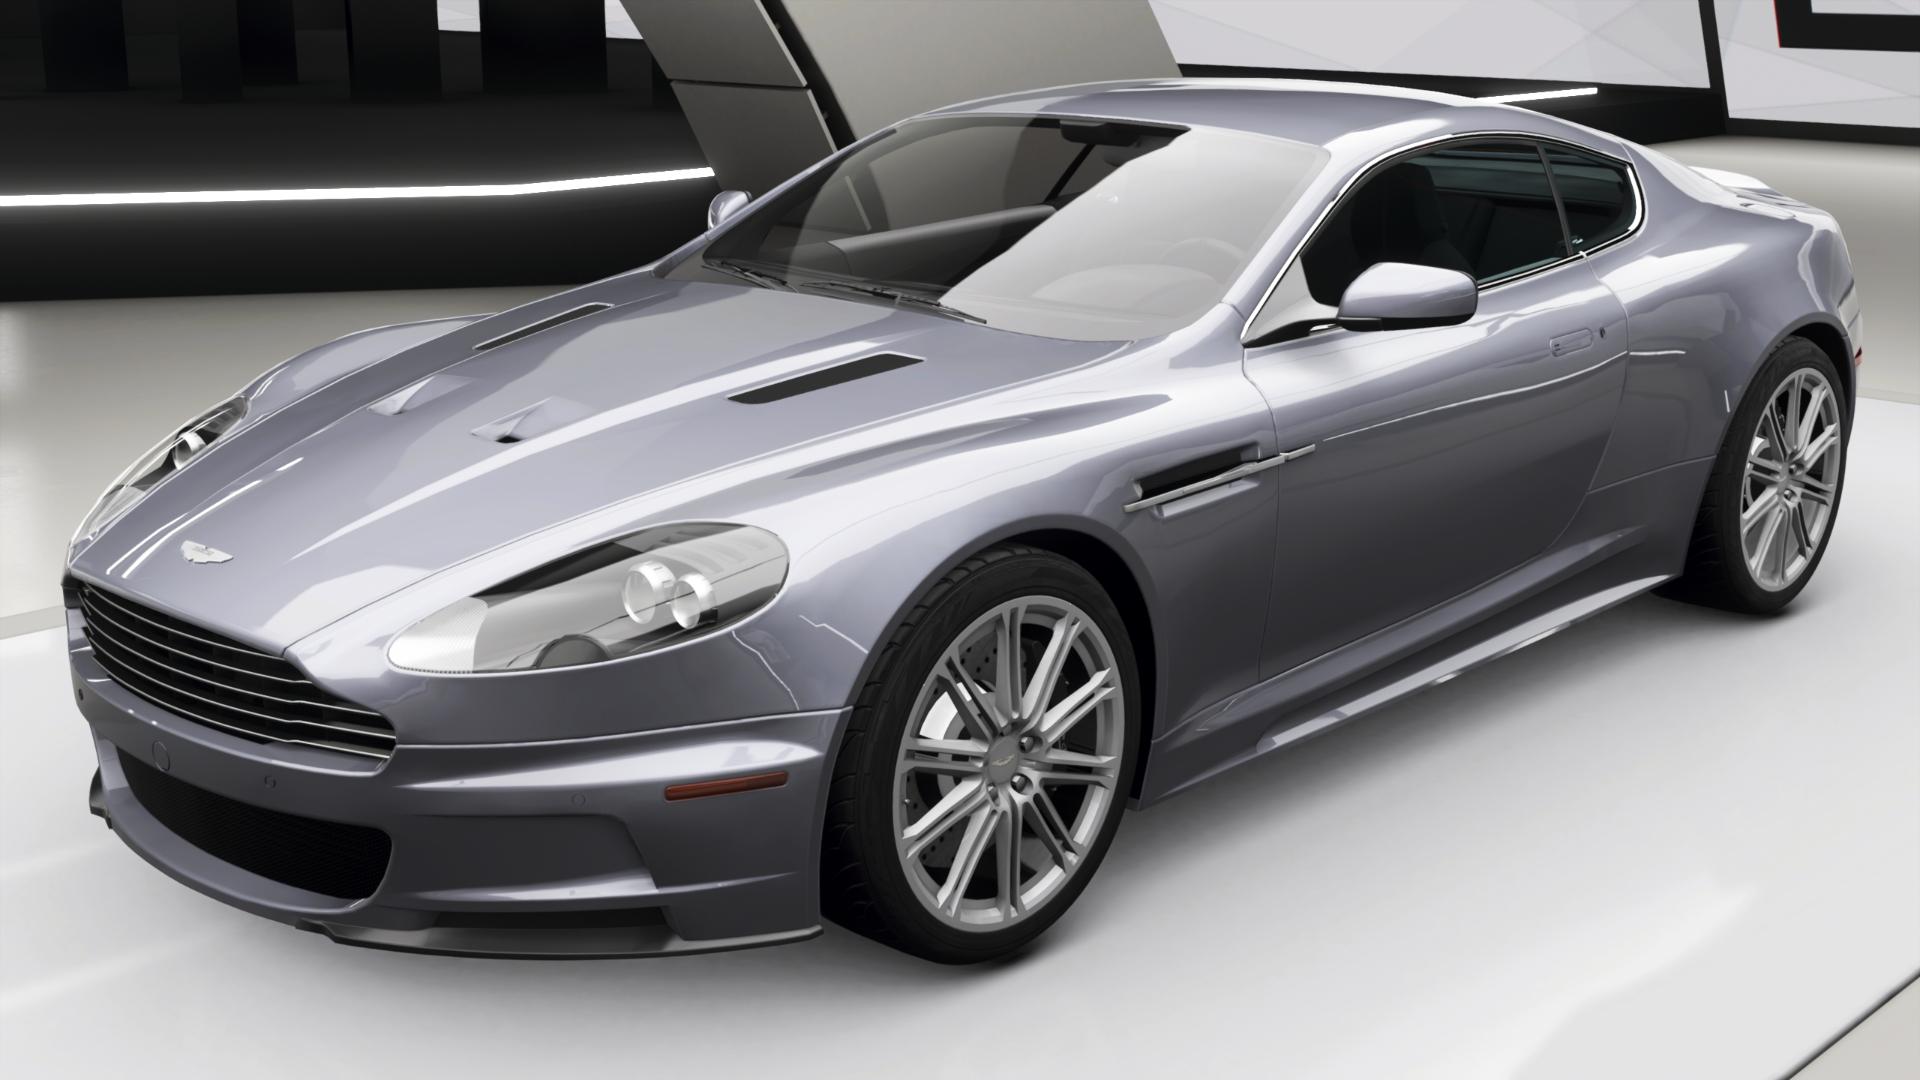 James Bond Edition Aston Martin Dbs 2008 Forza